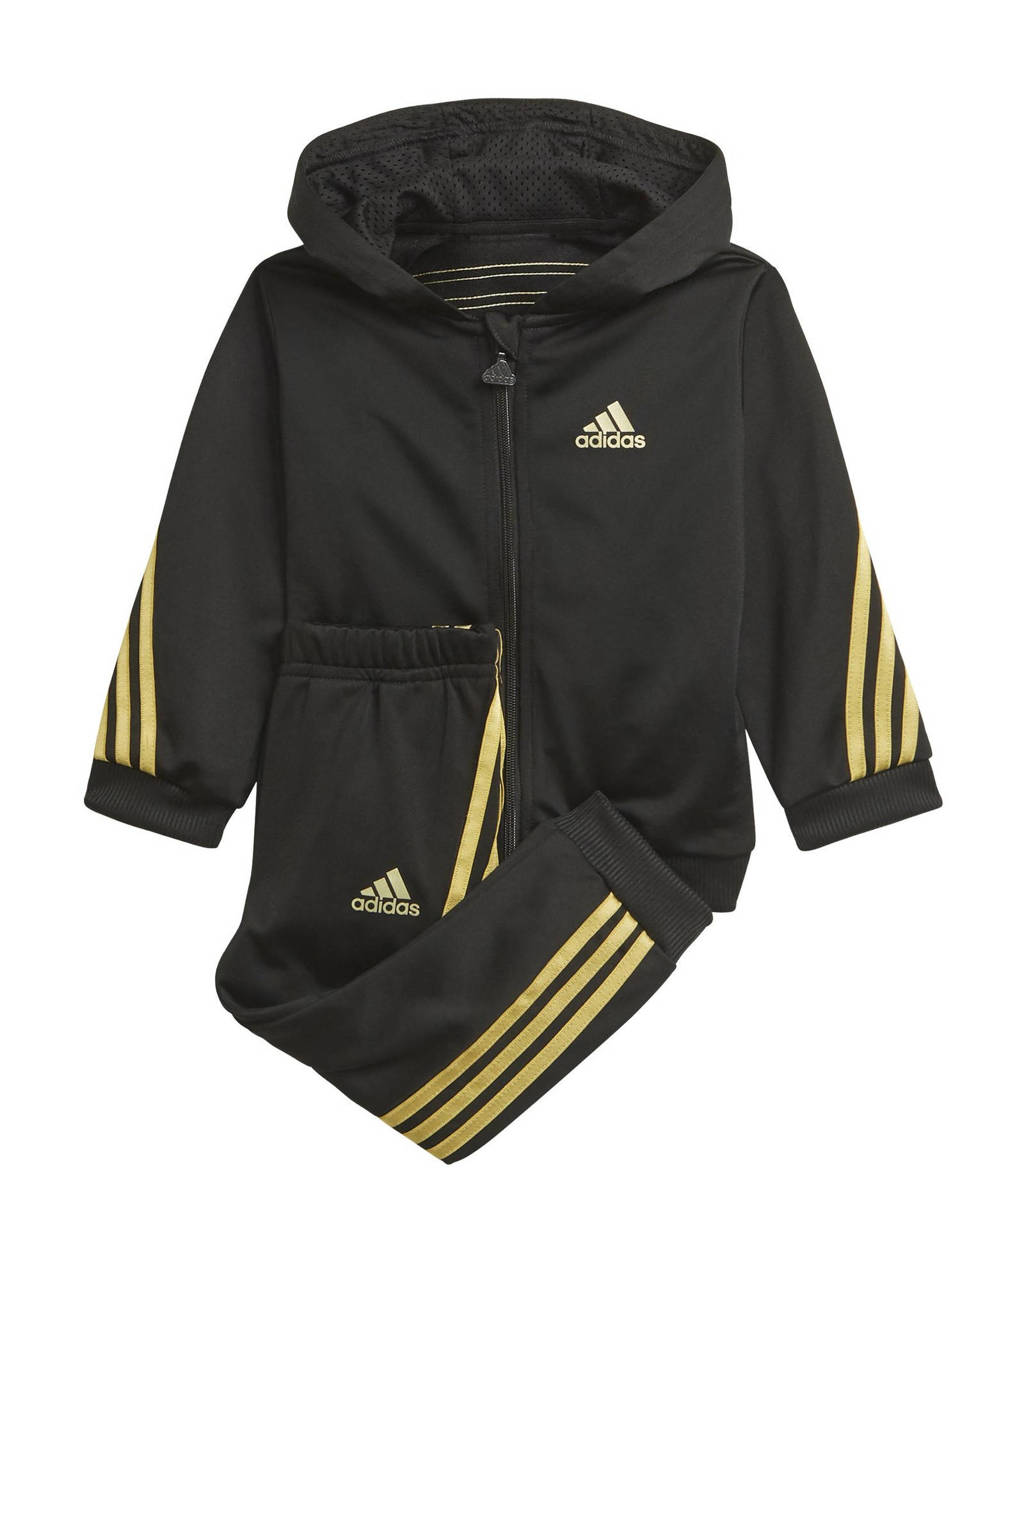 adidas Performance joggingpak zwart/goud, Zwart/goud